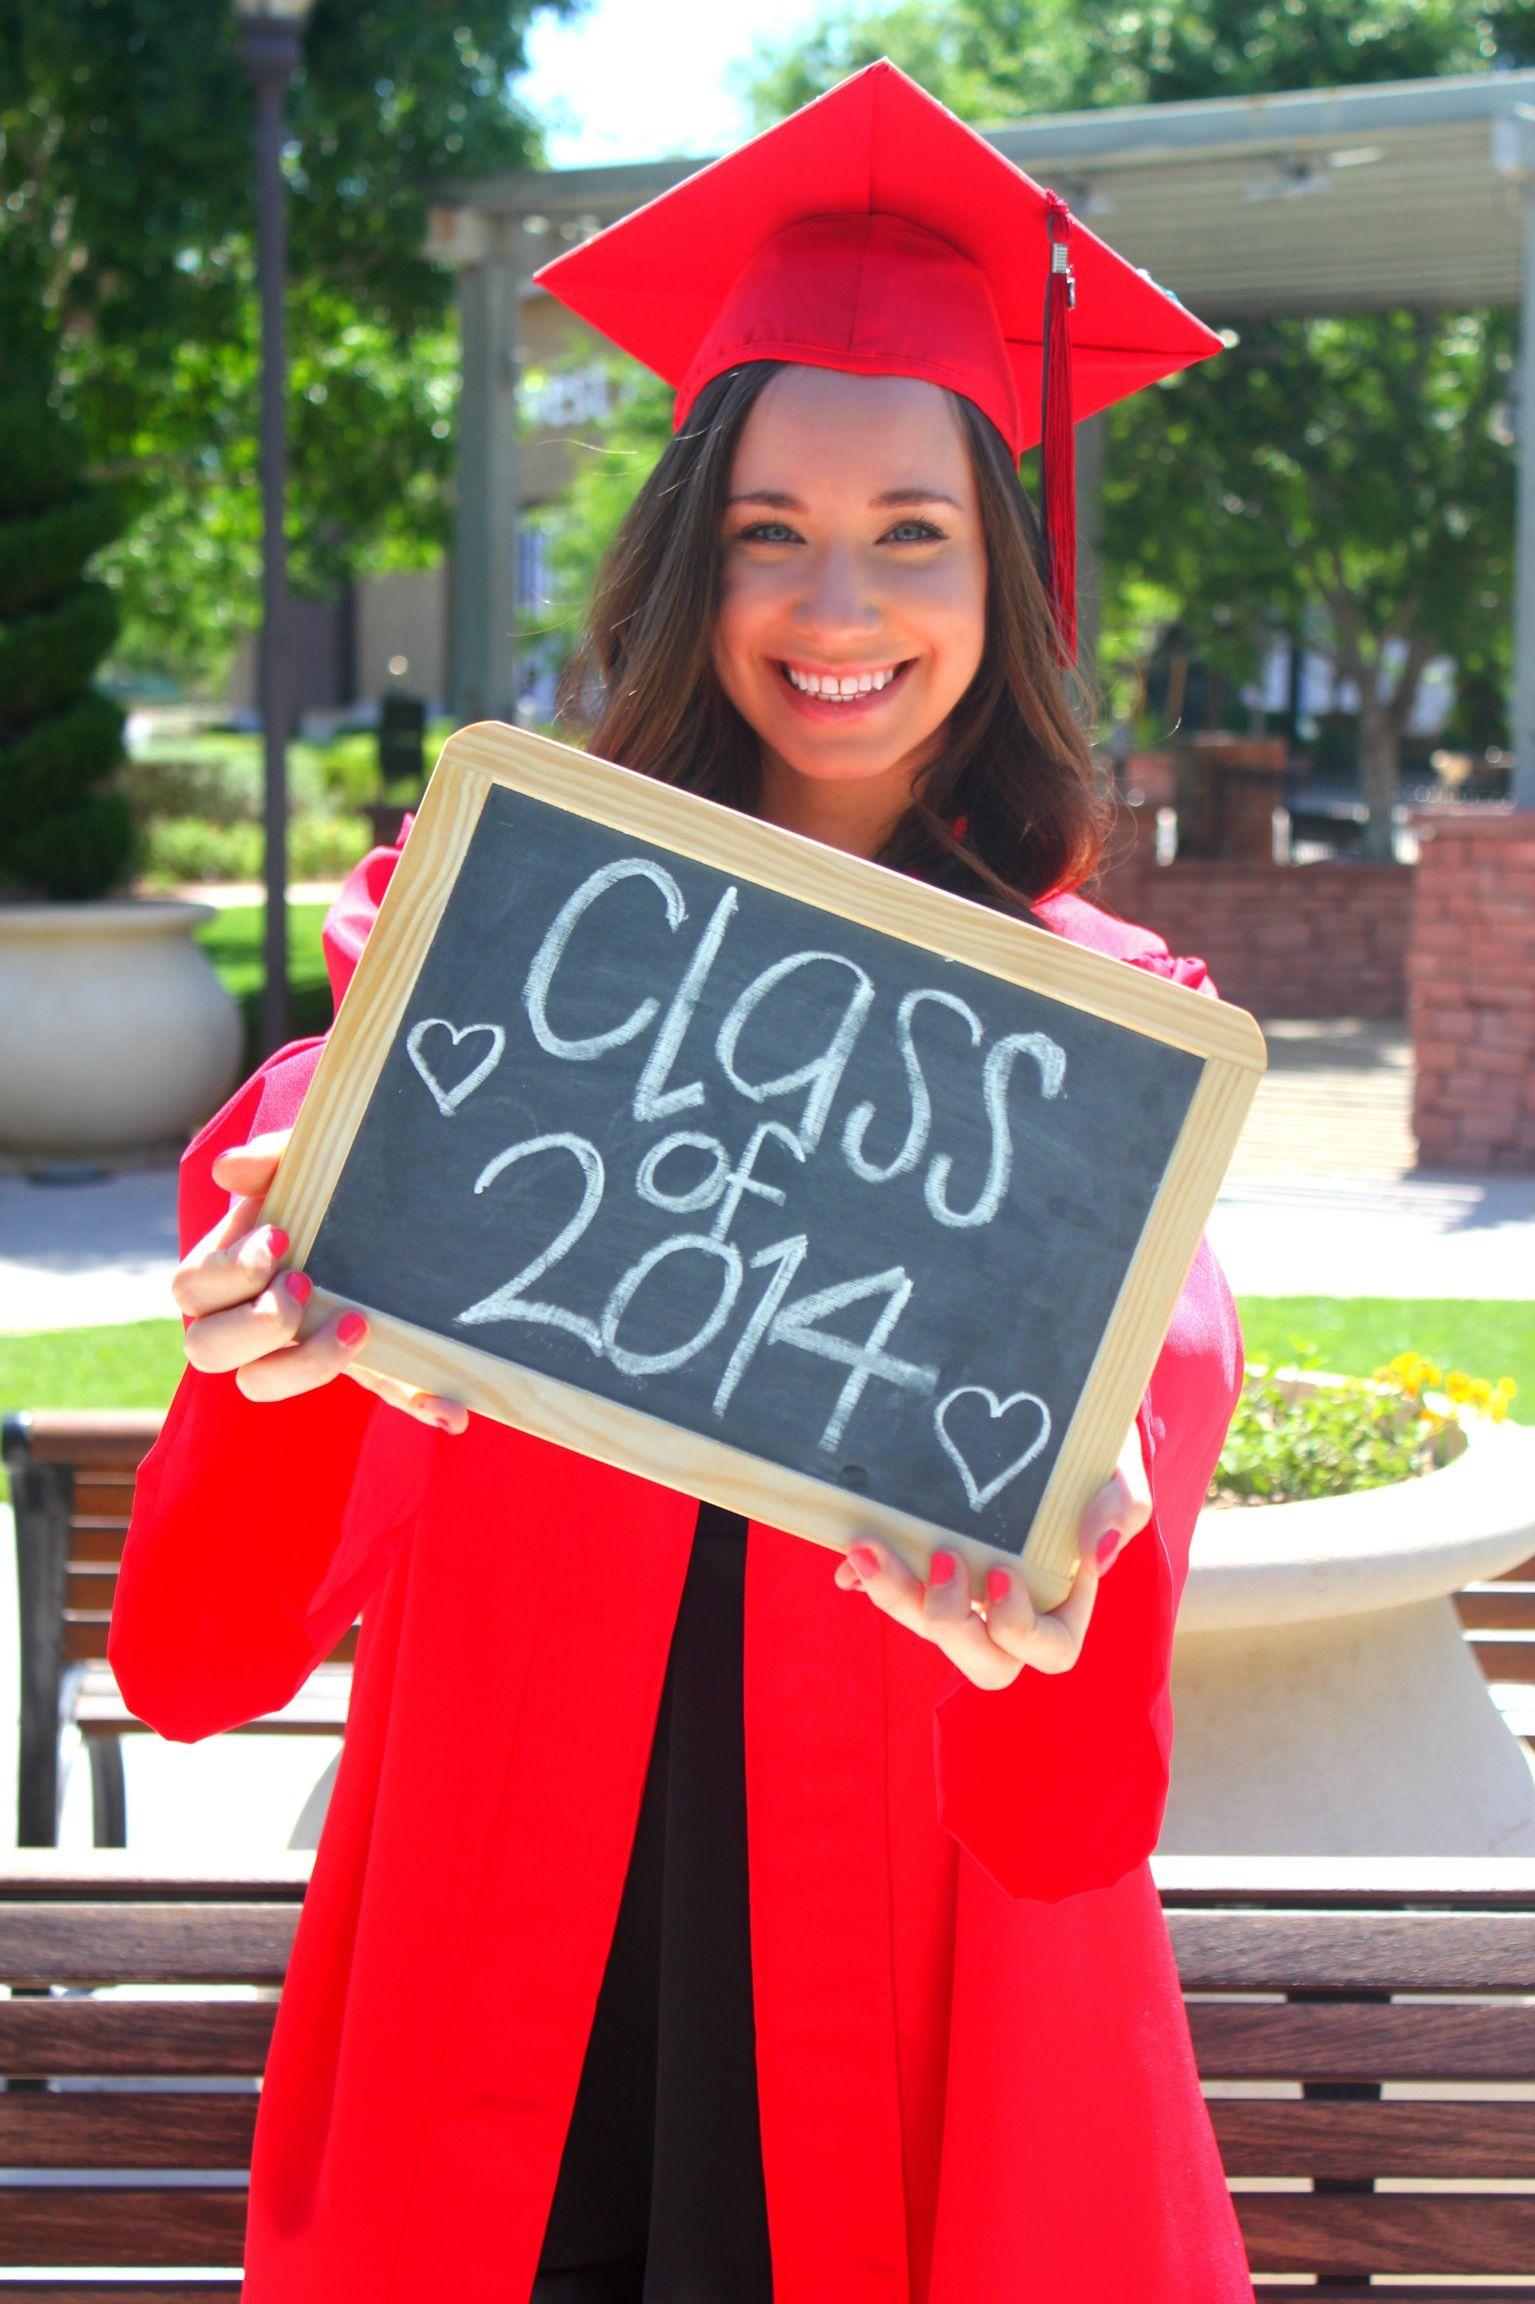 Graduation photo ideas! | Graduation photos, College ...